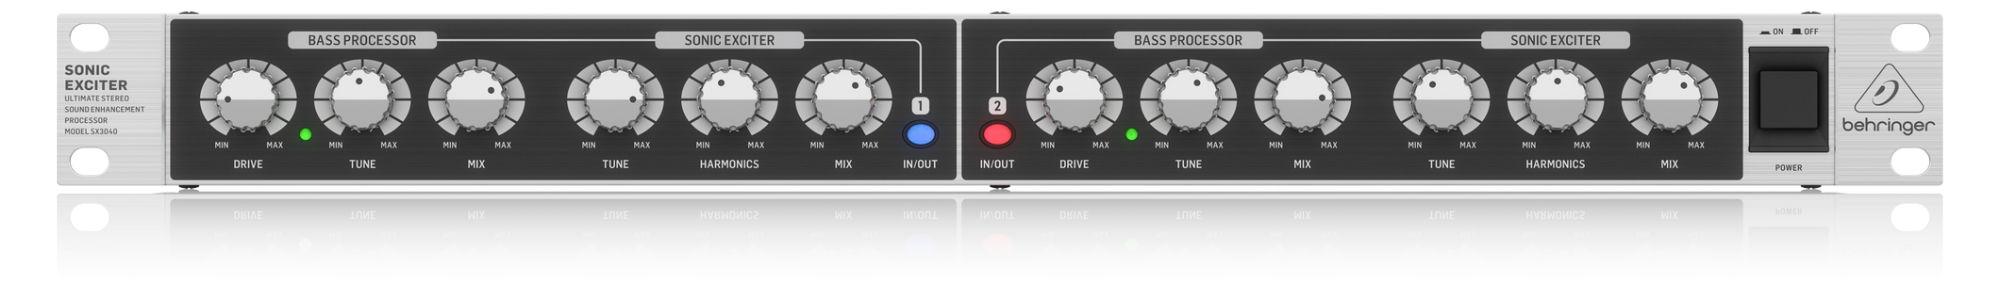 Studioeffekte - Behringer SX3040 V2 Sonic Exciter - Onlineshop Musikhaus Kirstein